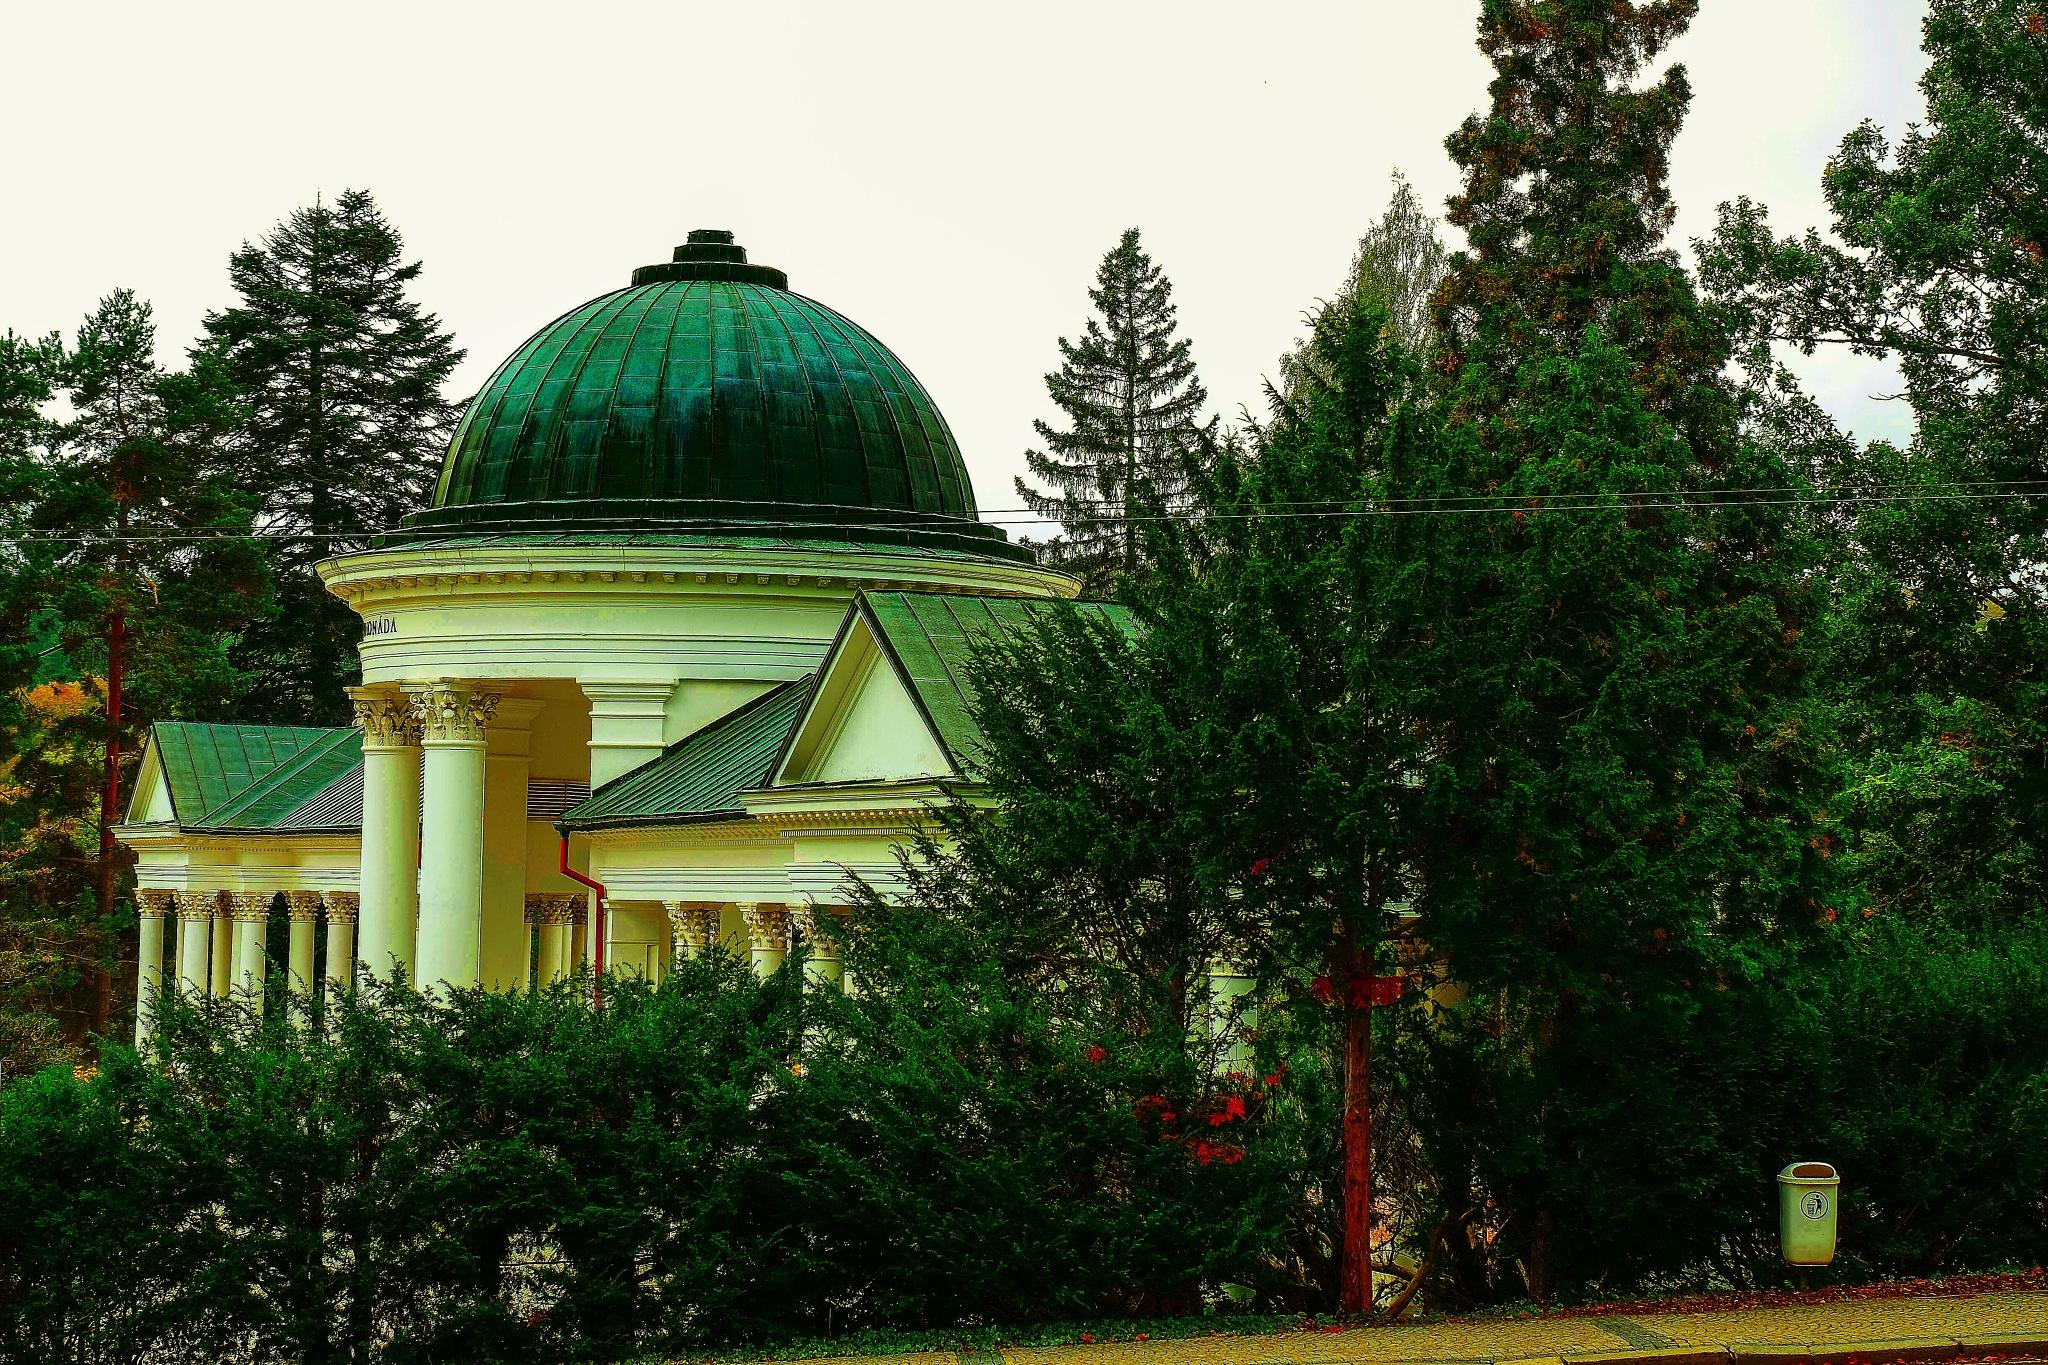 Emerald Roofs by sergey.parfeniuk